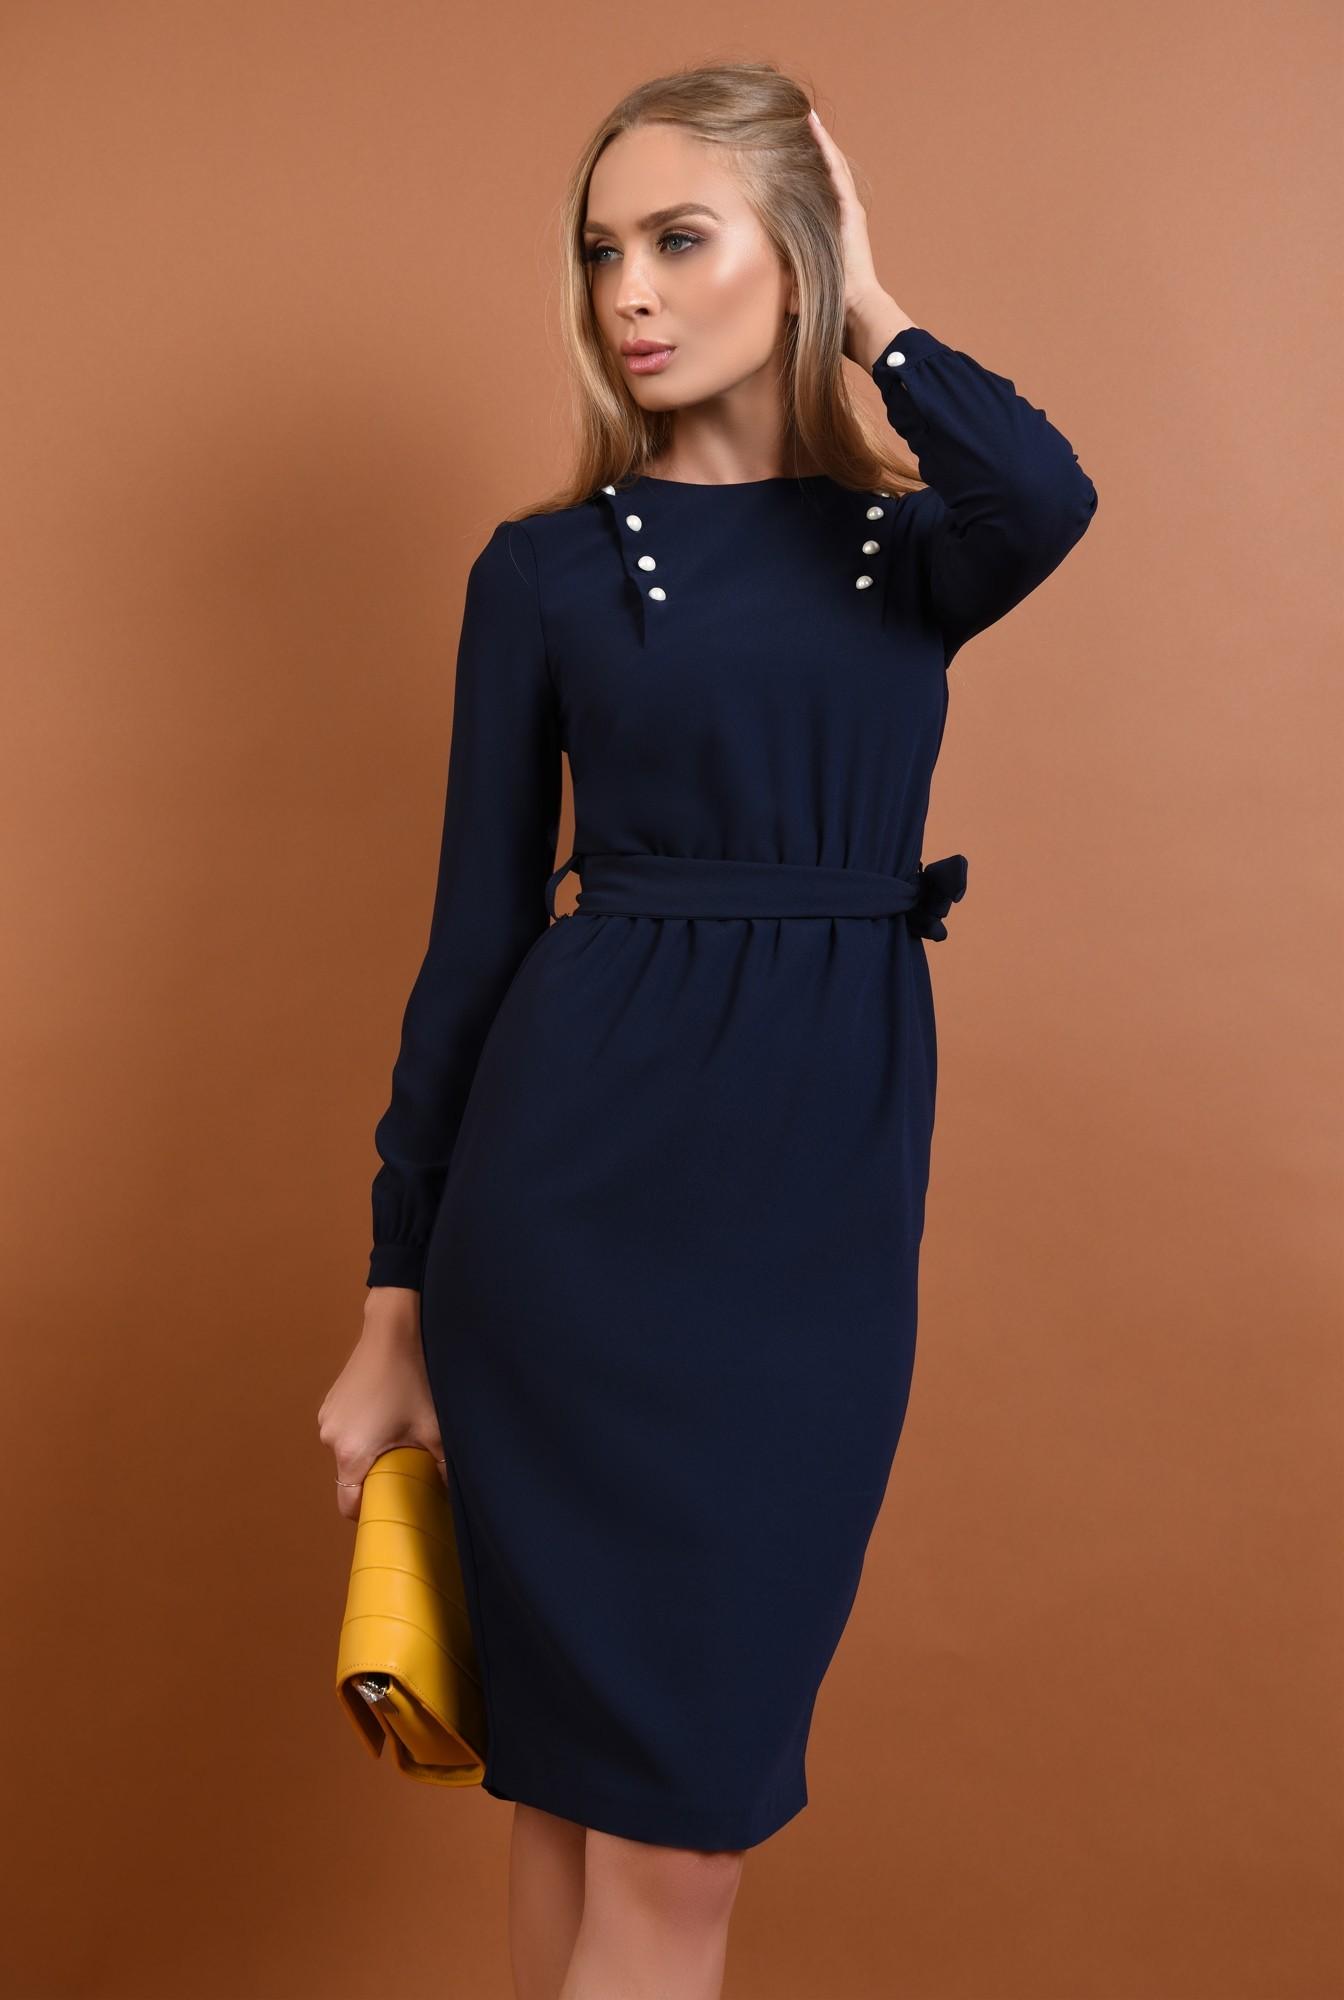 rochie de zi, midi, albastru, bleumarin, maneci lungi, mansete